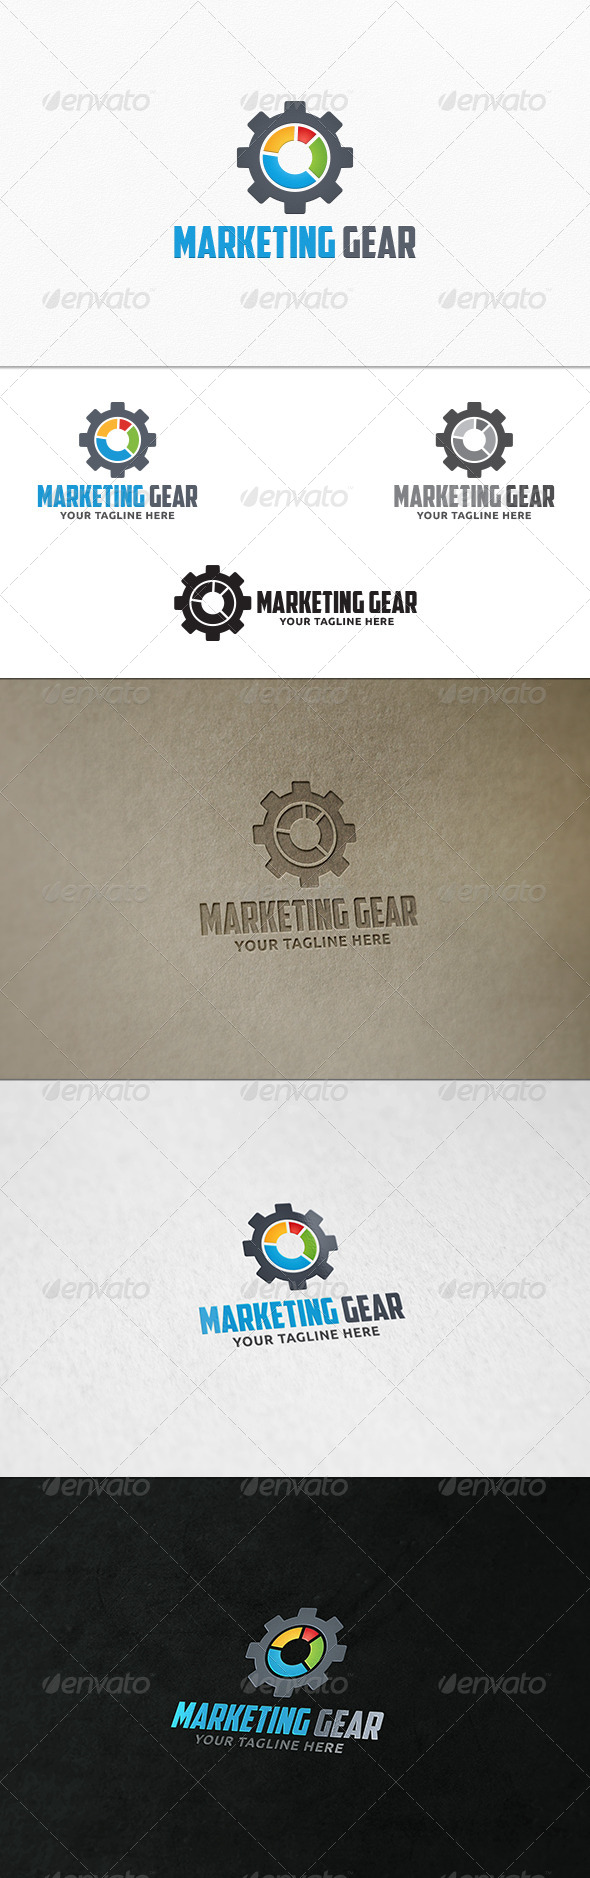 GraphicRiver Marketing Gear Logo Template 7706958